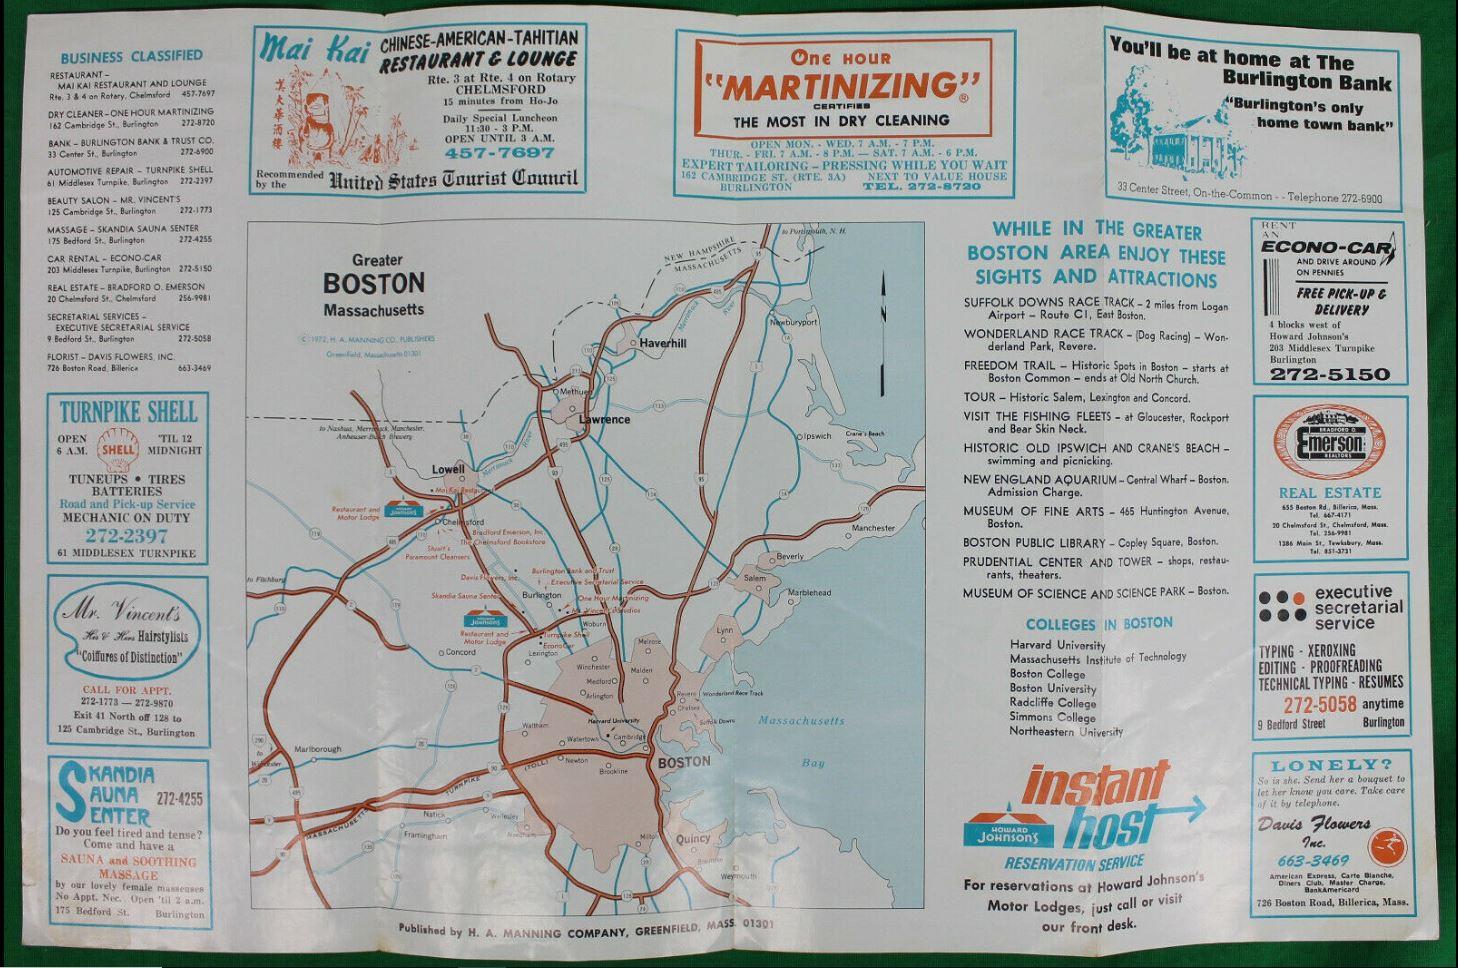 Howard Johnson's Motor Lodge Burlington MA brochure 2